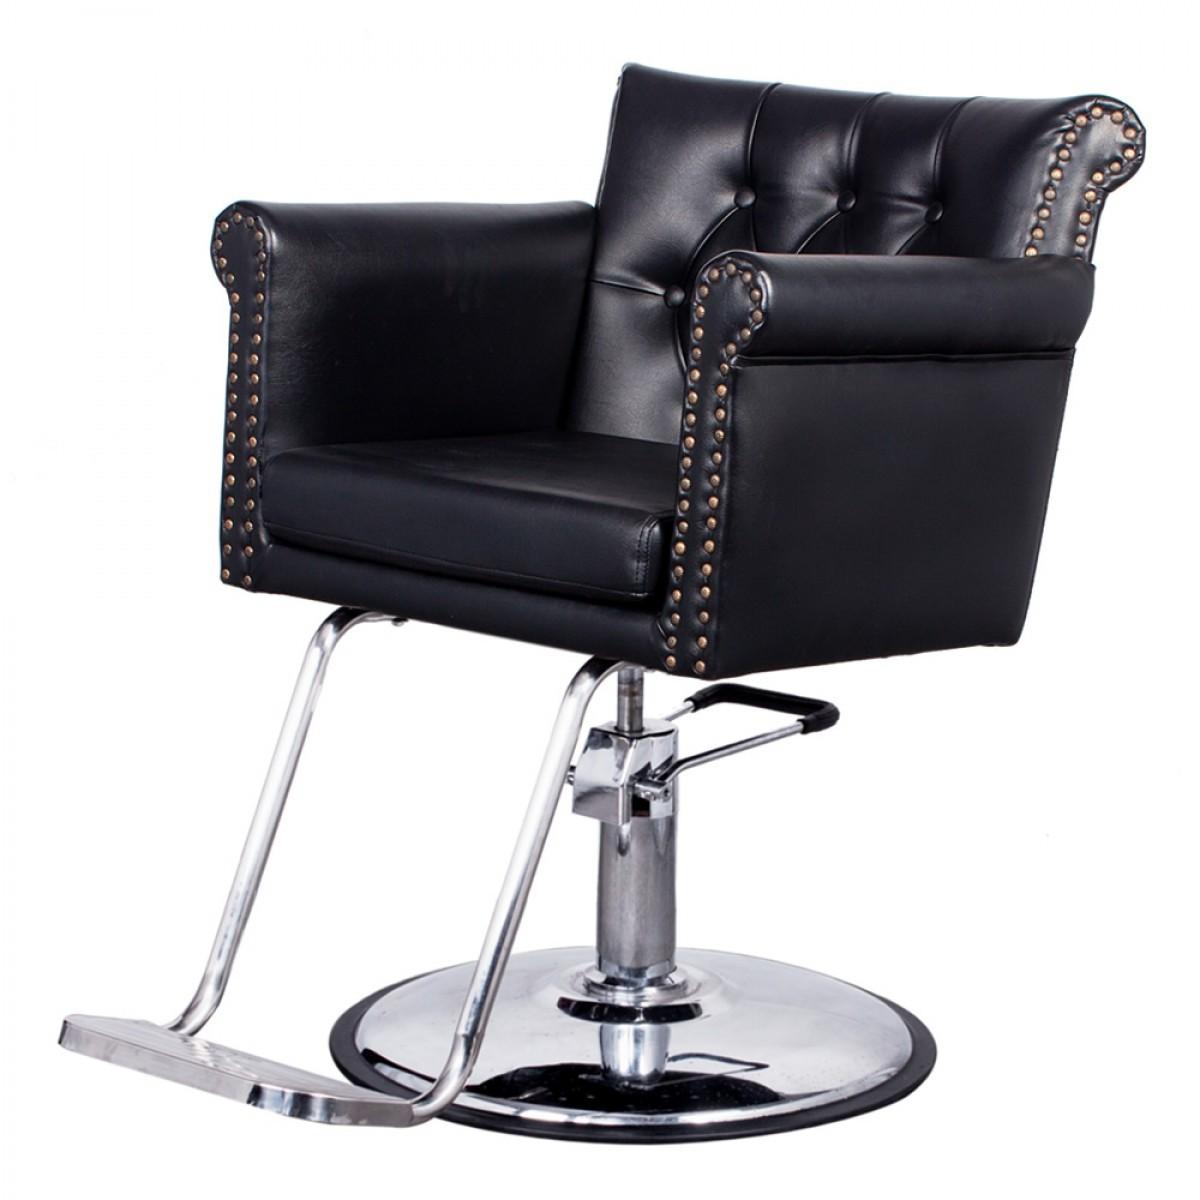 """CAPRI"" Salon Styling Chair"